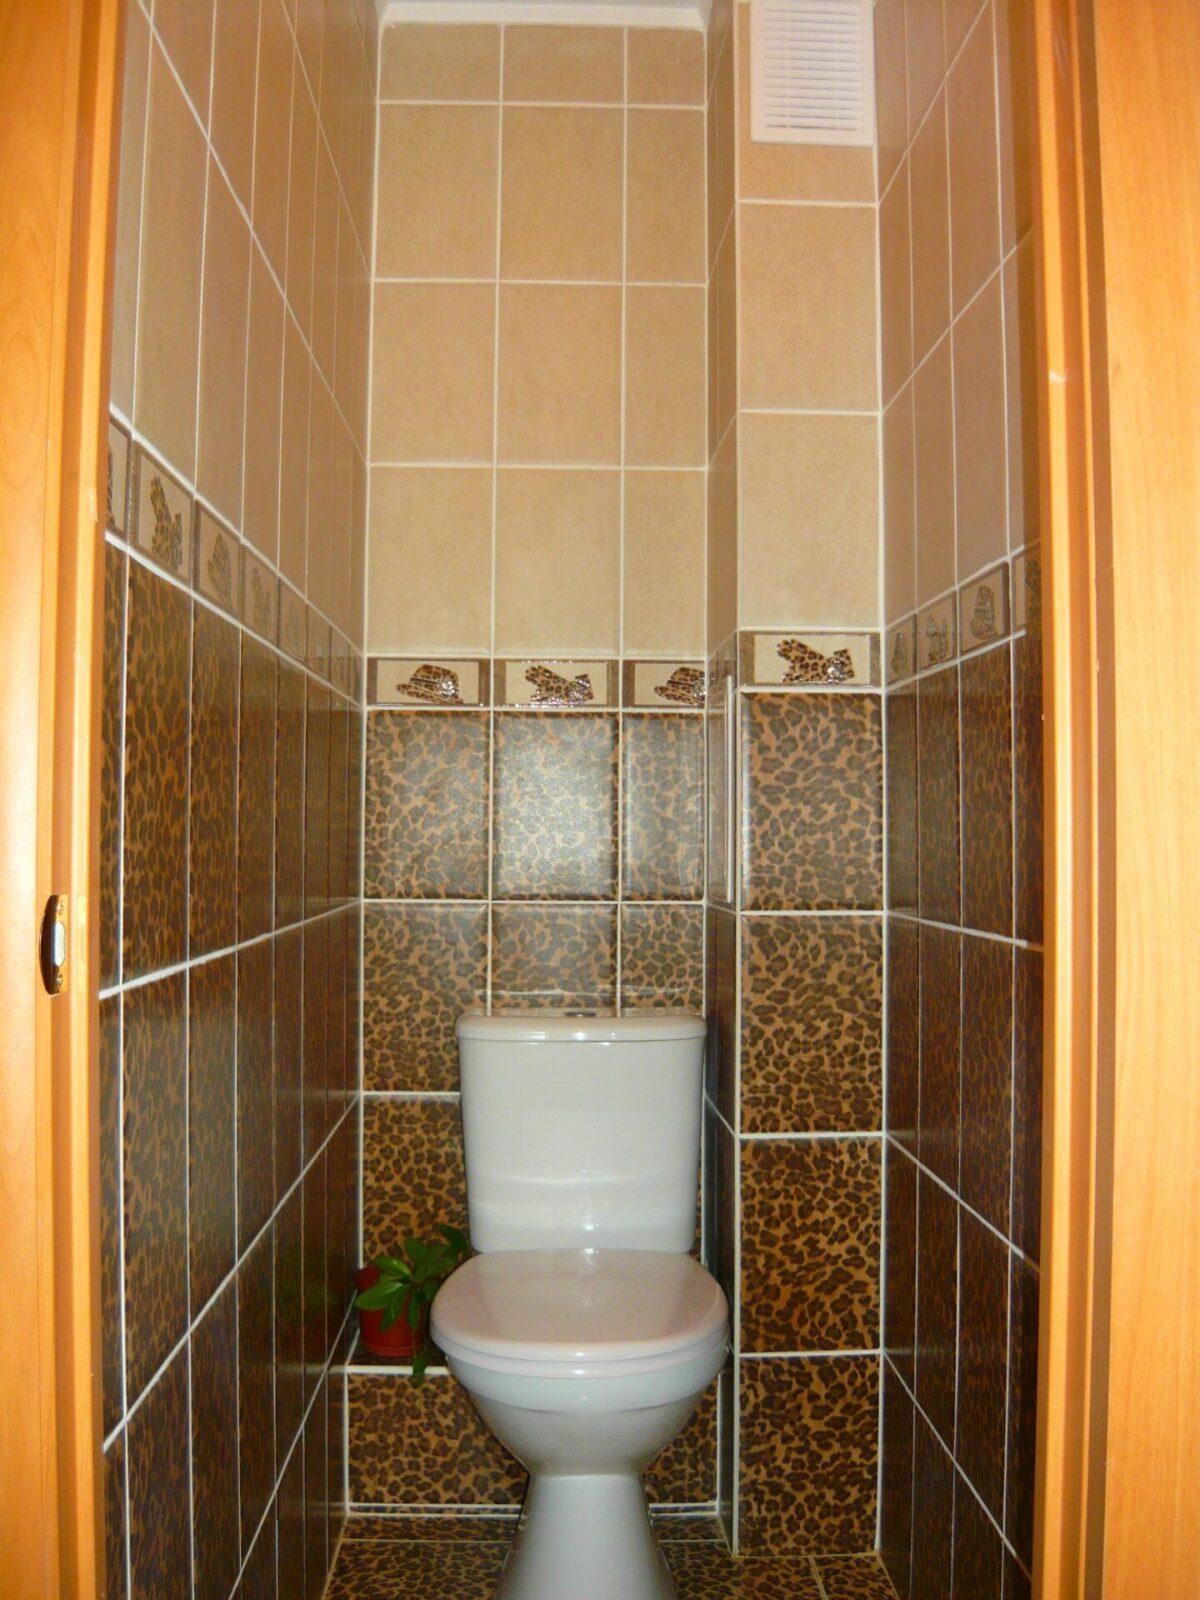 Декор для туалета из плитки